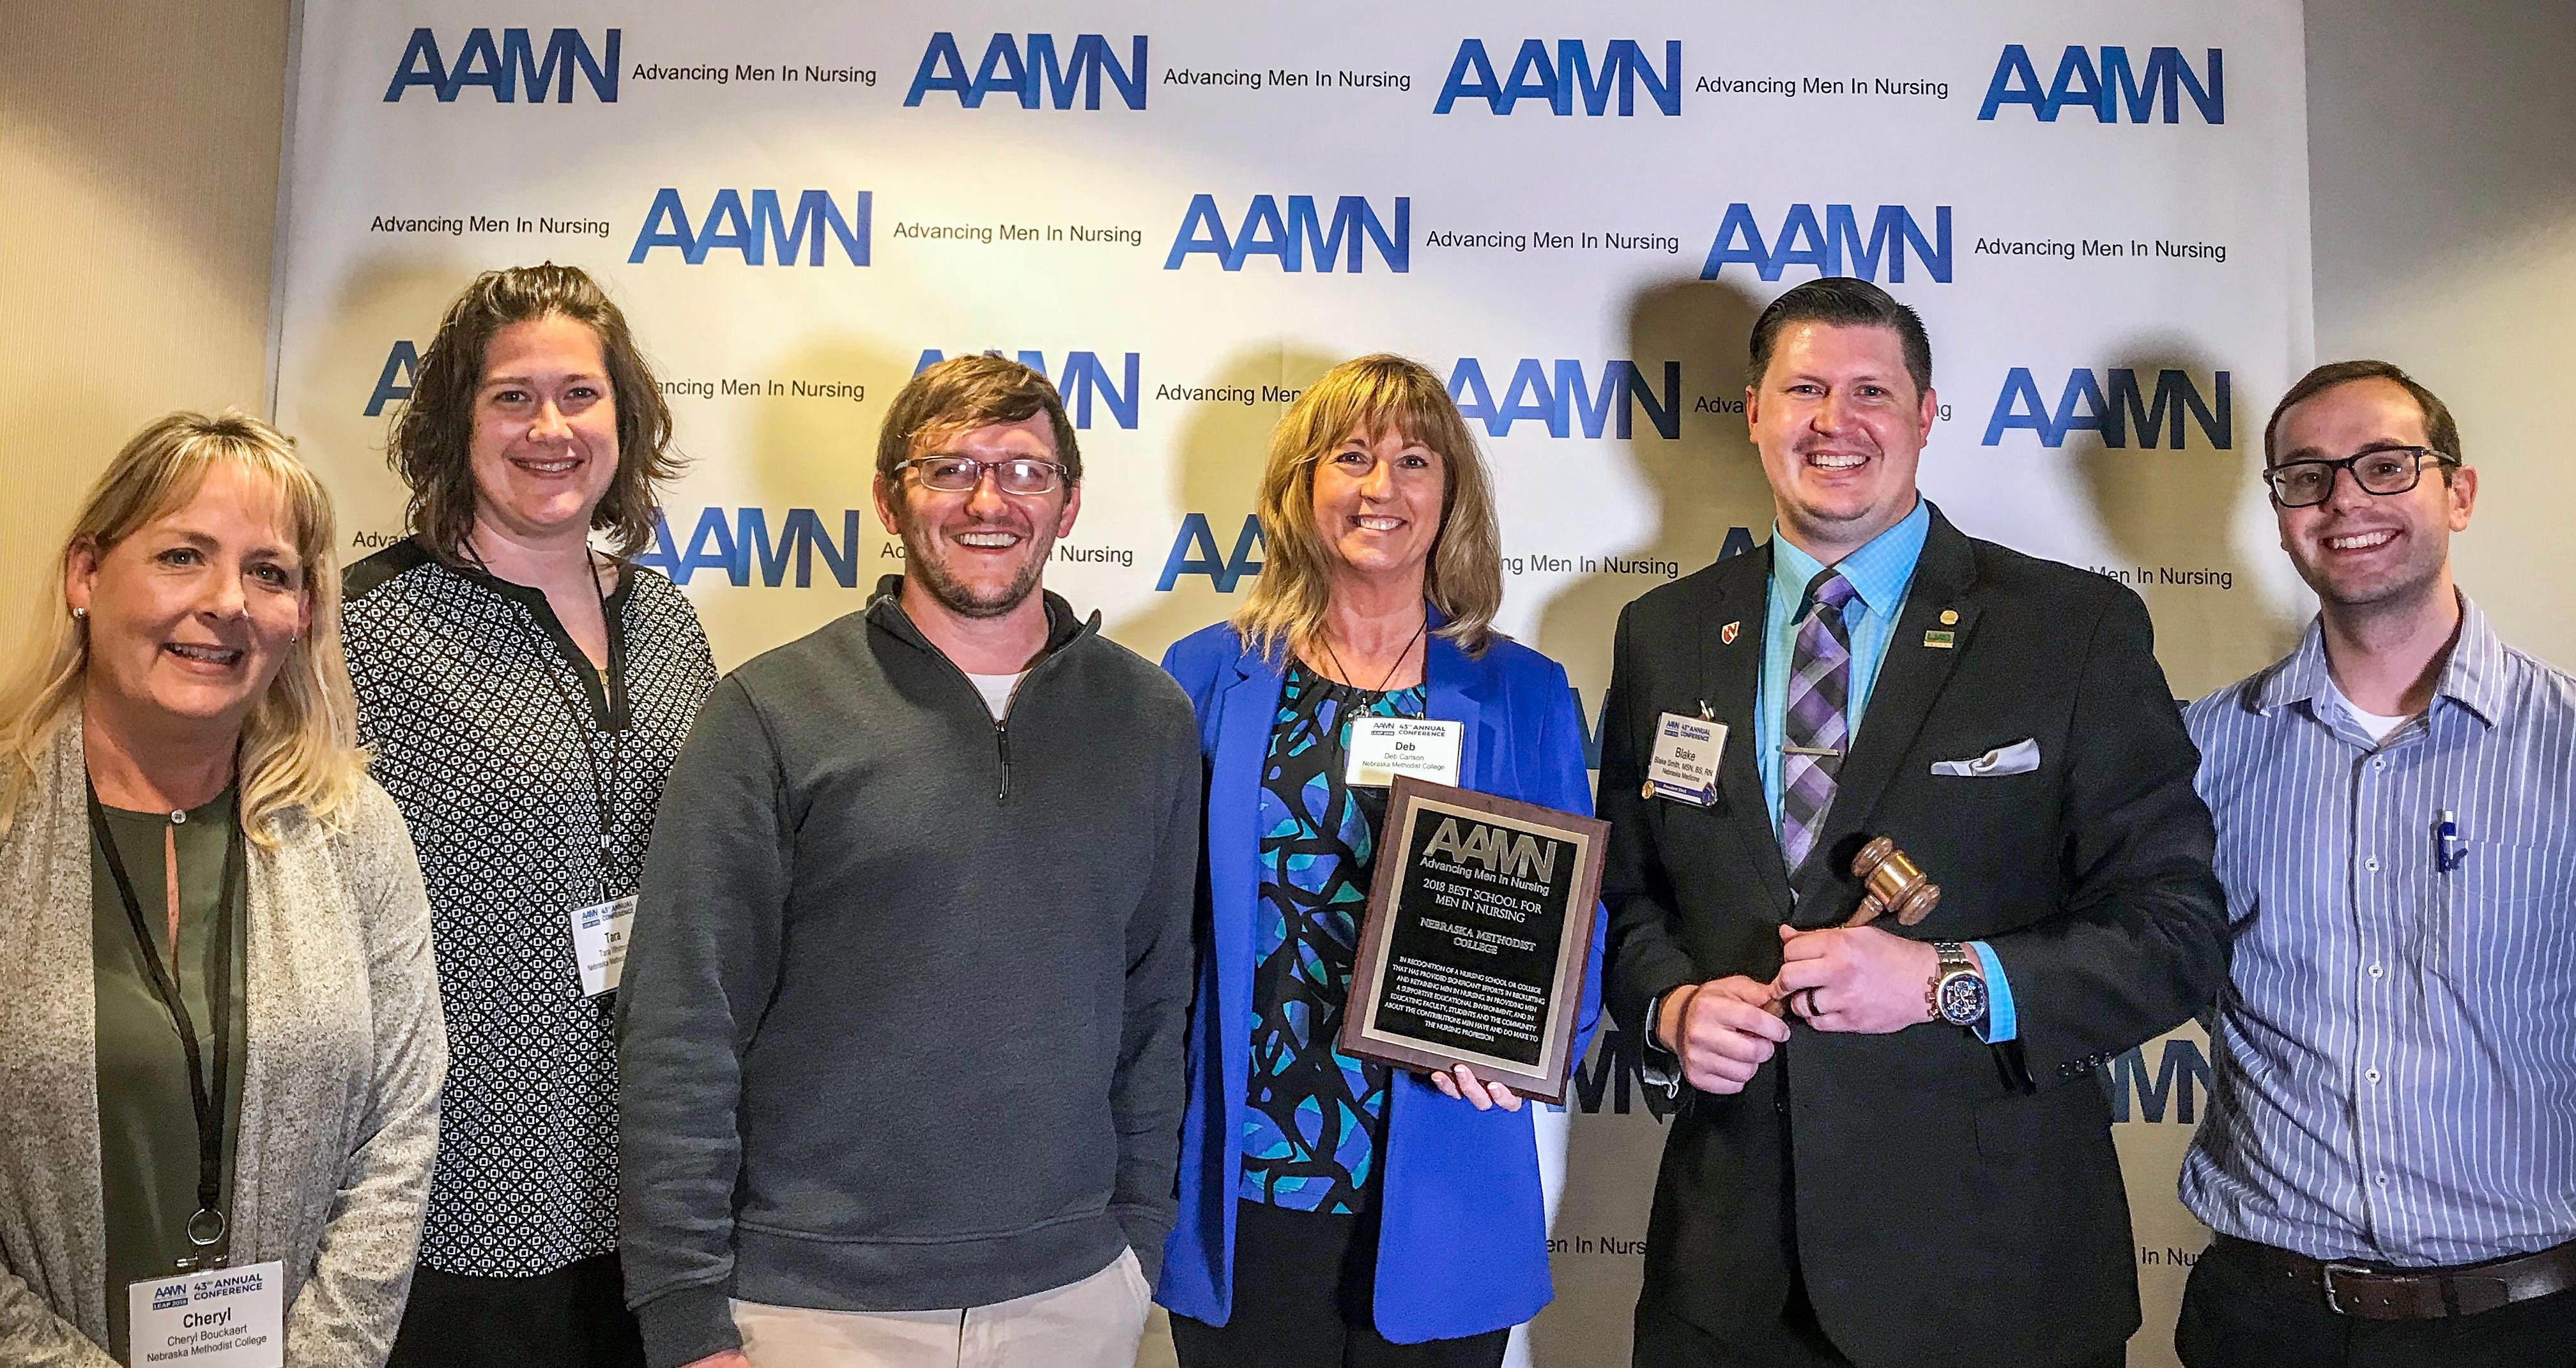 Shown at the AAMN Conference with the 2018 Best Schools Award, from left: NMC Assistant Professor Cheryl Bouckaert, MSN, BSN, RN; NMC BSN-DNP Program Director Tara Whitmire, DNP, APRN-NP; NMC DNP student and alumnus Troy Beekman BSN, RN; NMC President/CEO Deb Carlson, PhD; AAMN President and NMC alumnus Blake Smith, MSN, BSN, RN; NMC ACE Program nursing student Nathan Johnson.